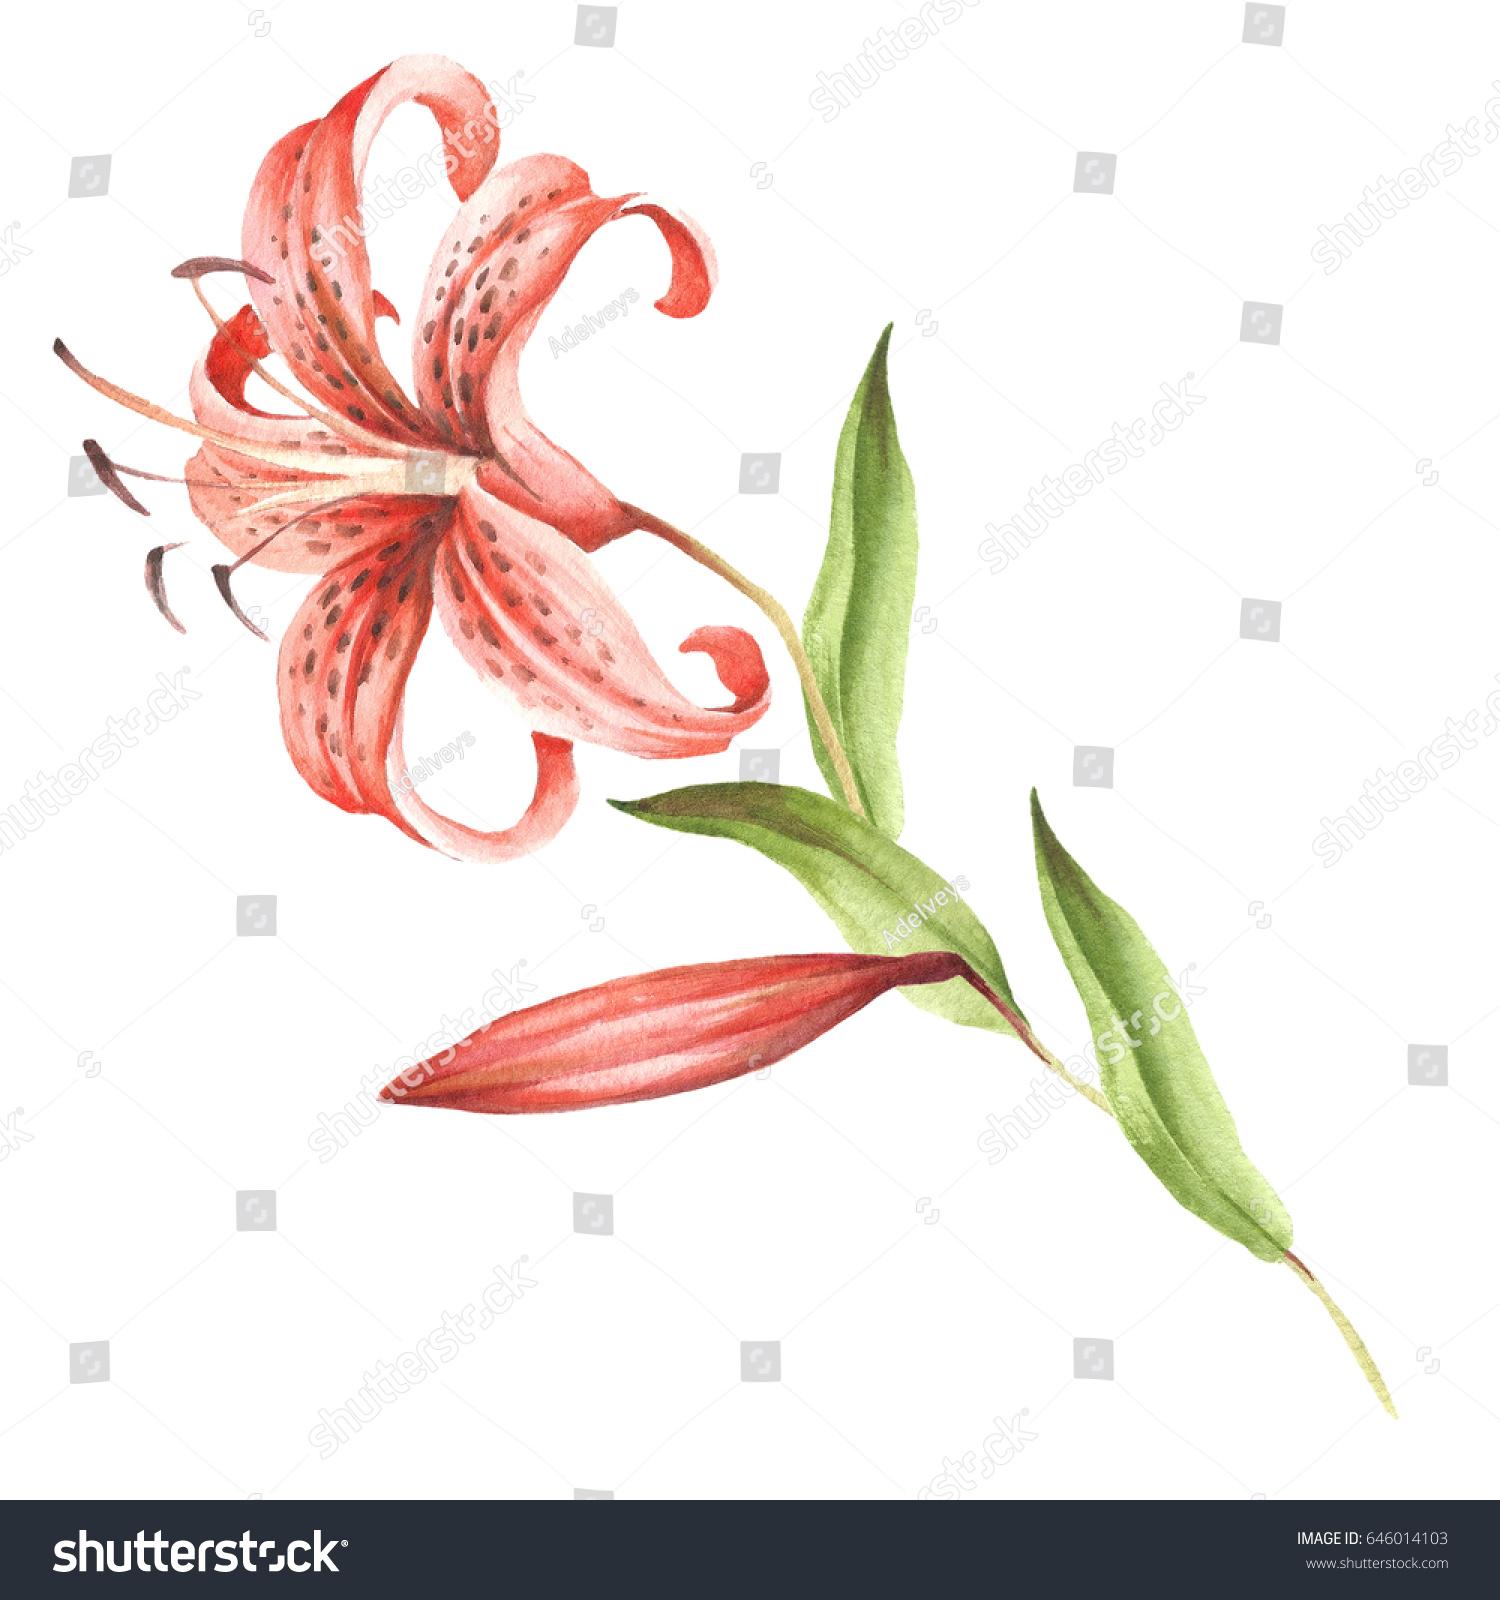 Image tiger lily flowers hand draw stock illustration 646014103 image tiger lily flowers hand draw watercolor illustration izmirmasajfo